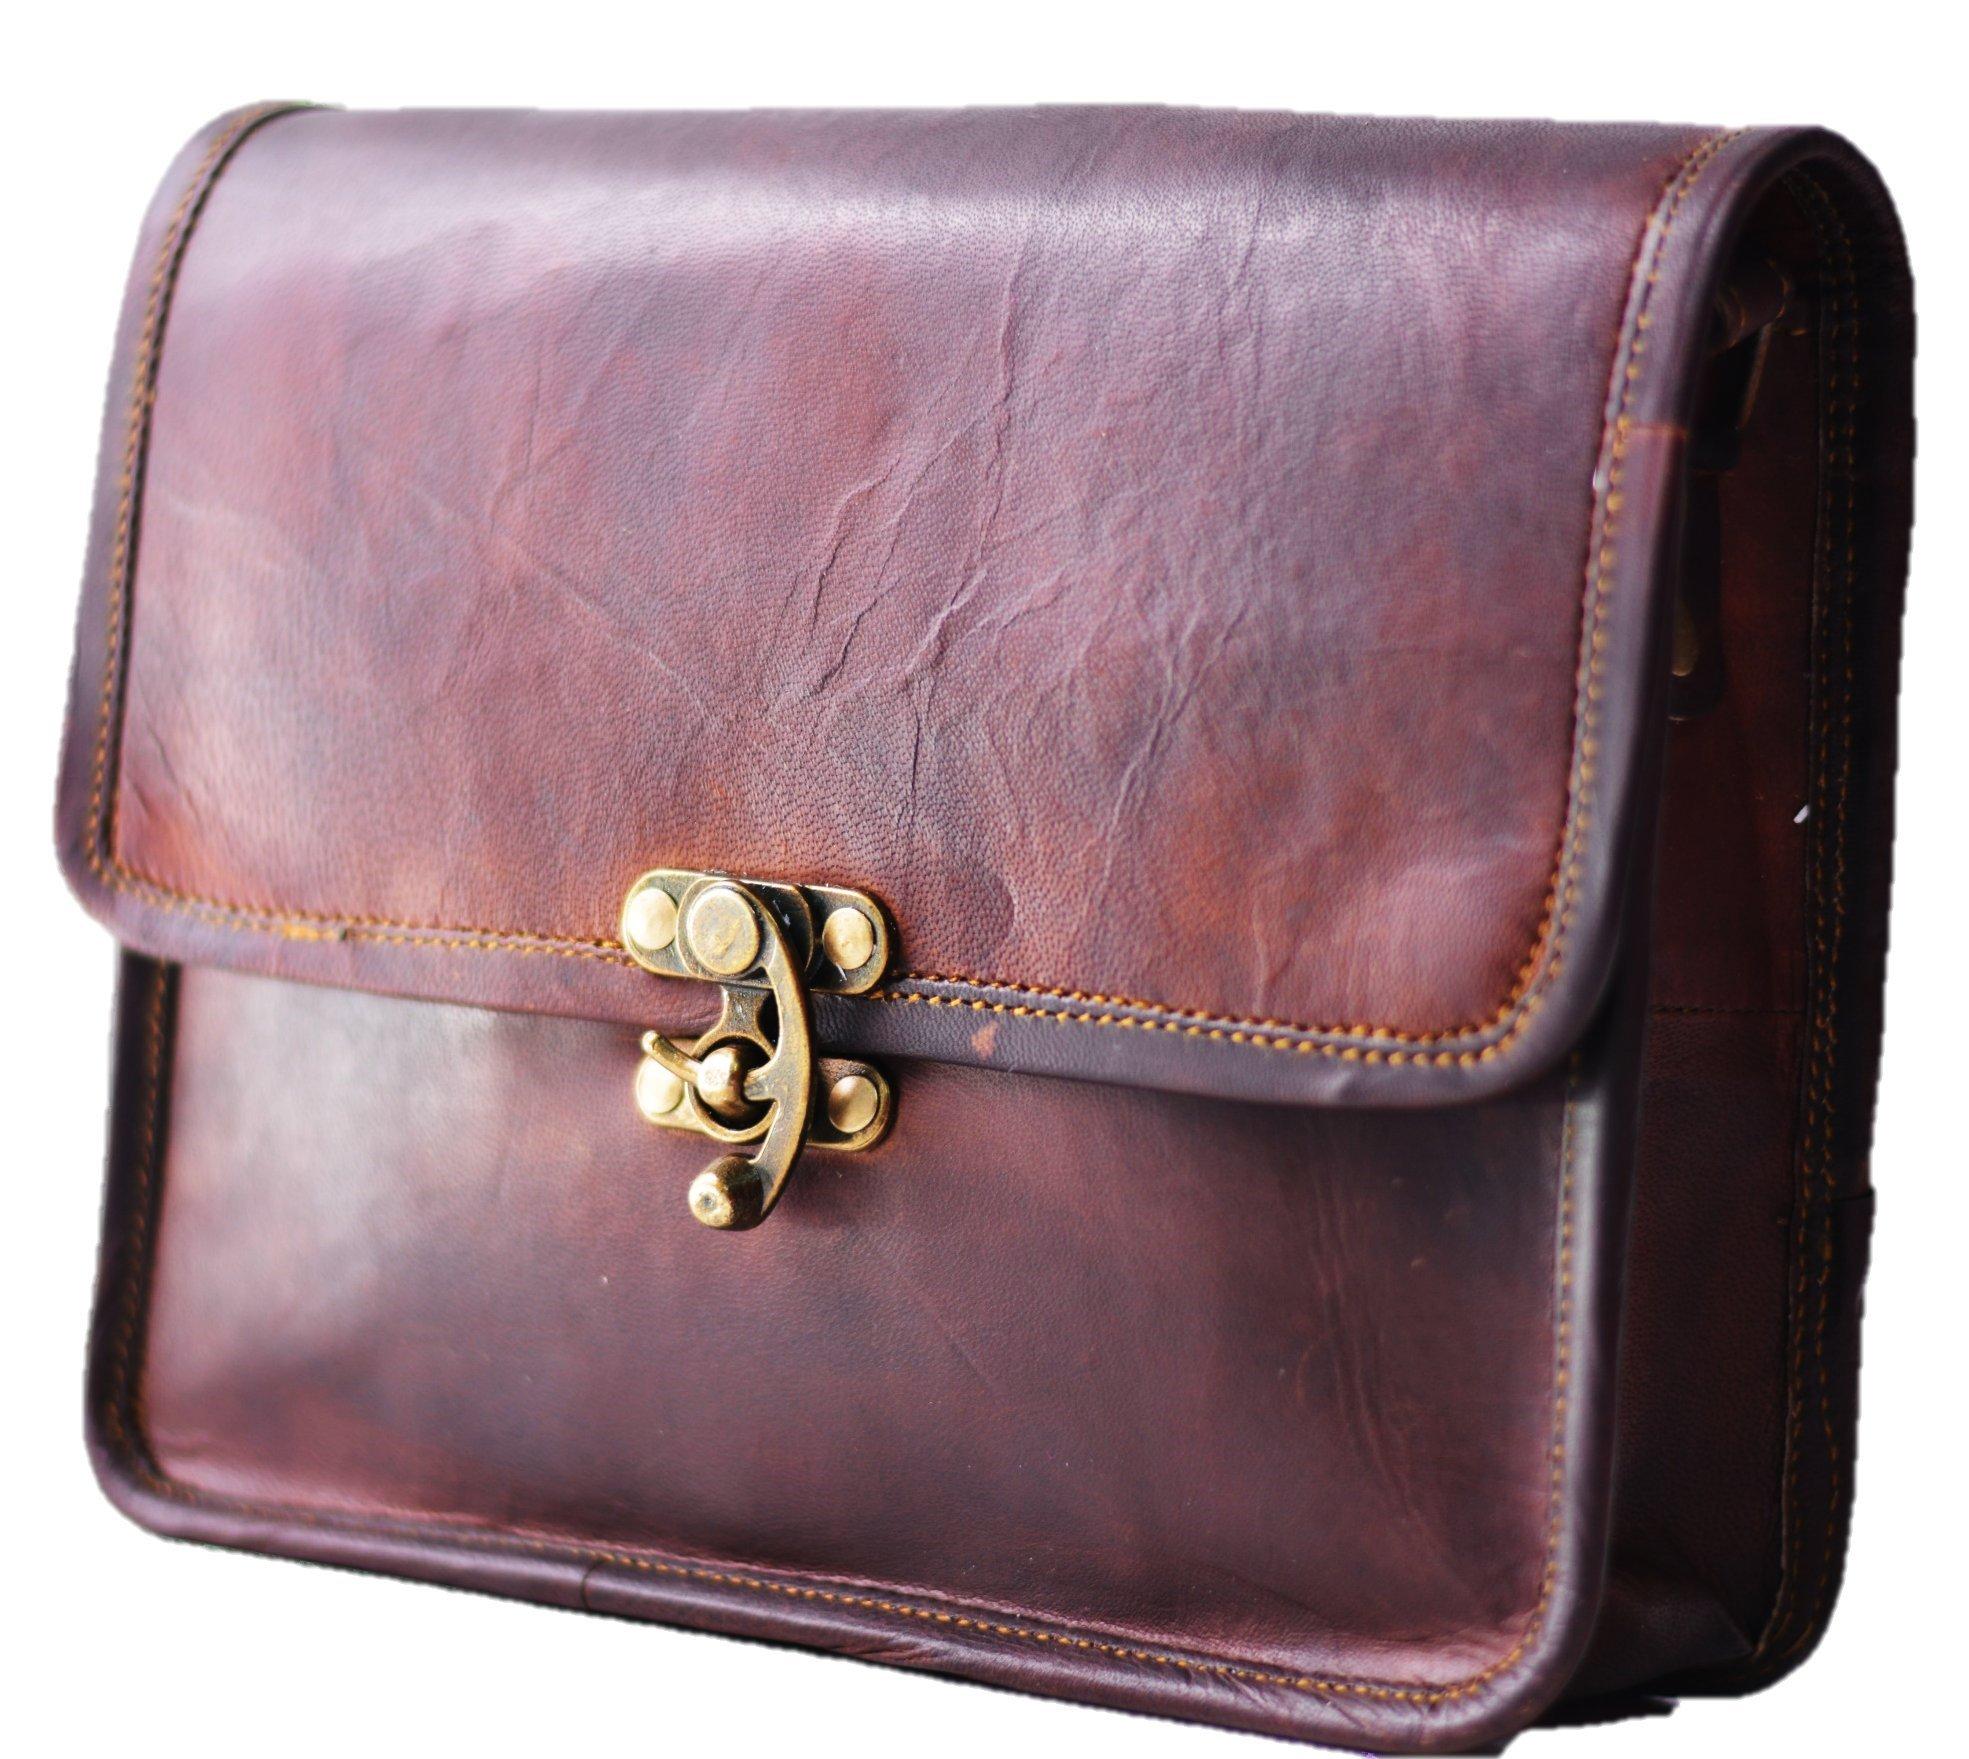 Leather Women's Hippie Leather Purse Cross-body Shoulder Bag Travel Satchel Handbag tote 9'' x 7''